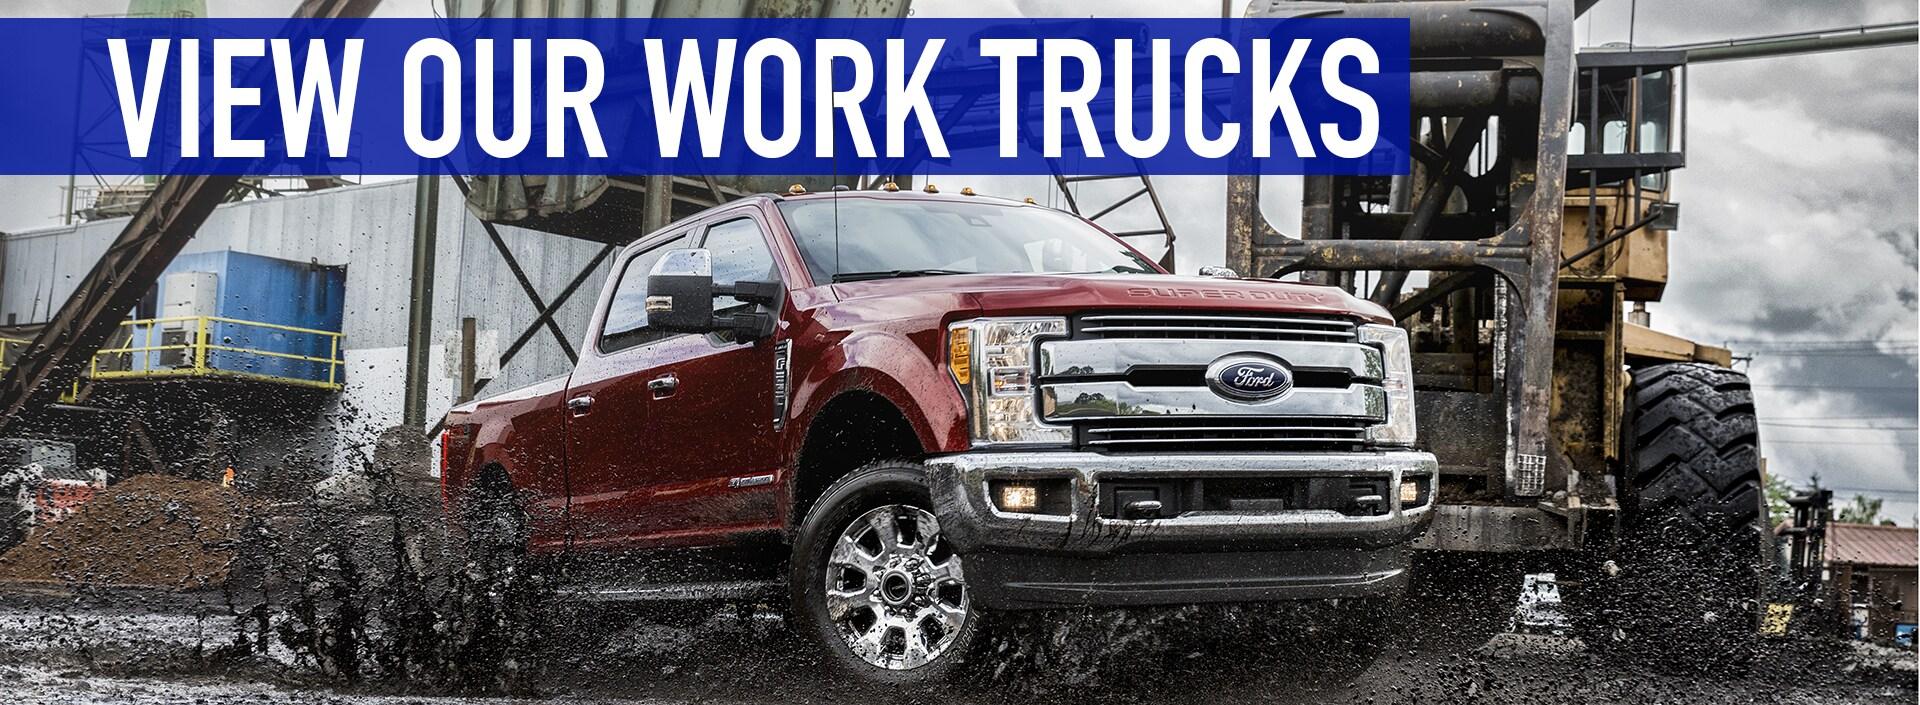 Craigslist Cars And Trucks For Sale By Dealer Portland ...